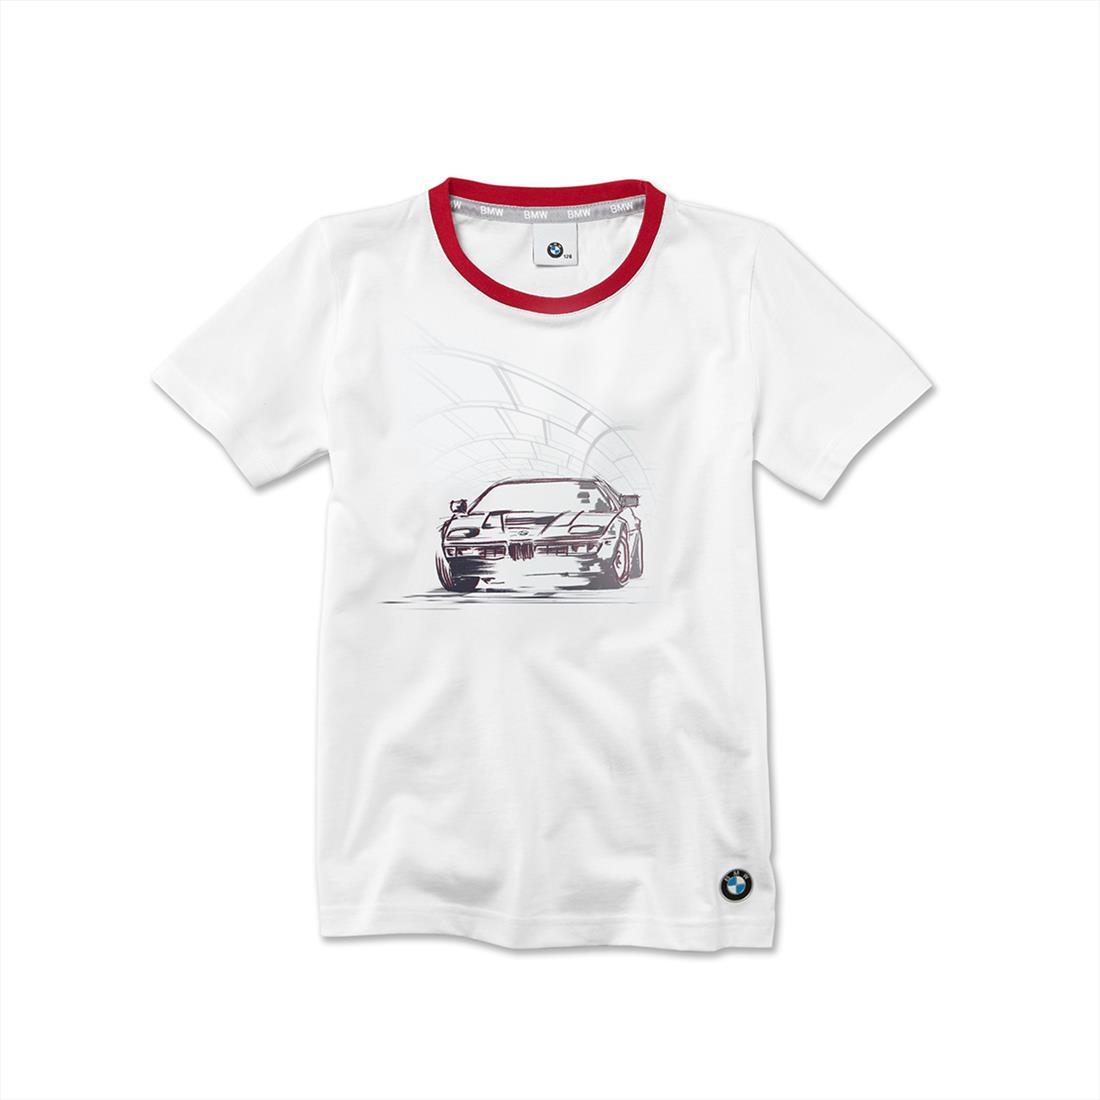 BMW T SHIRT GRAPHIC KIDS